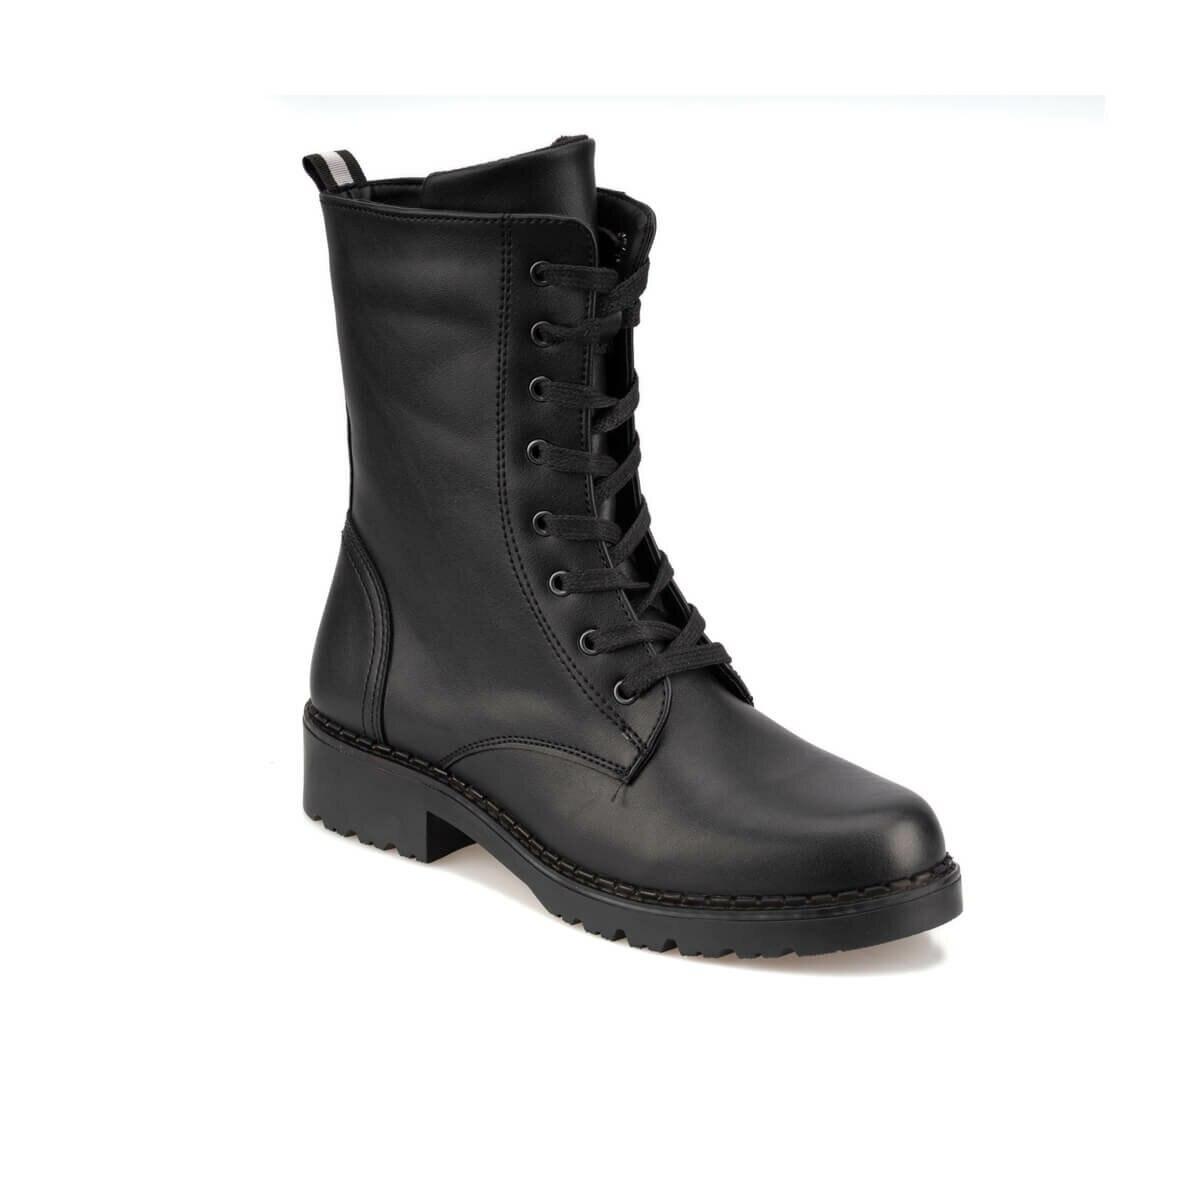 FLO 92.314664.Z Black Women Boots Polaris